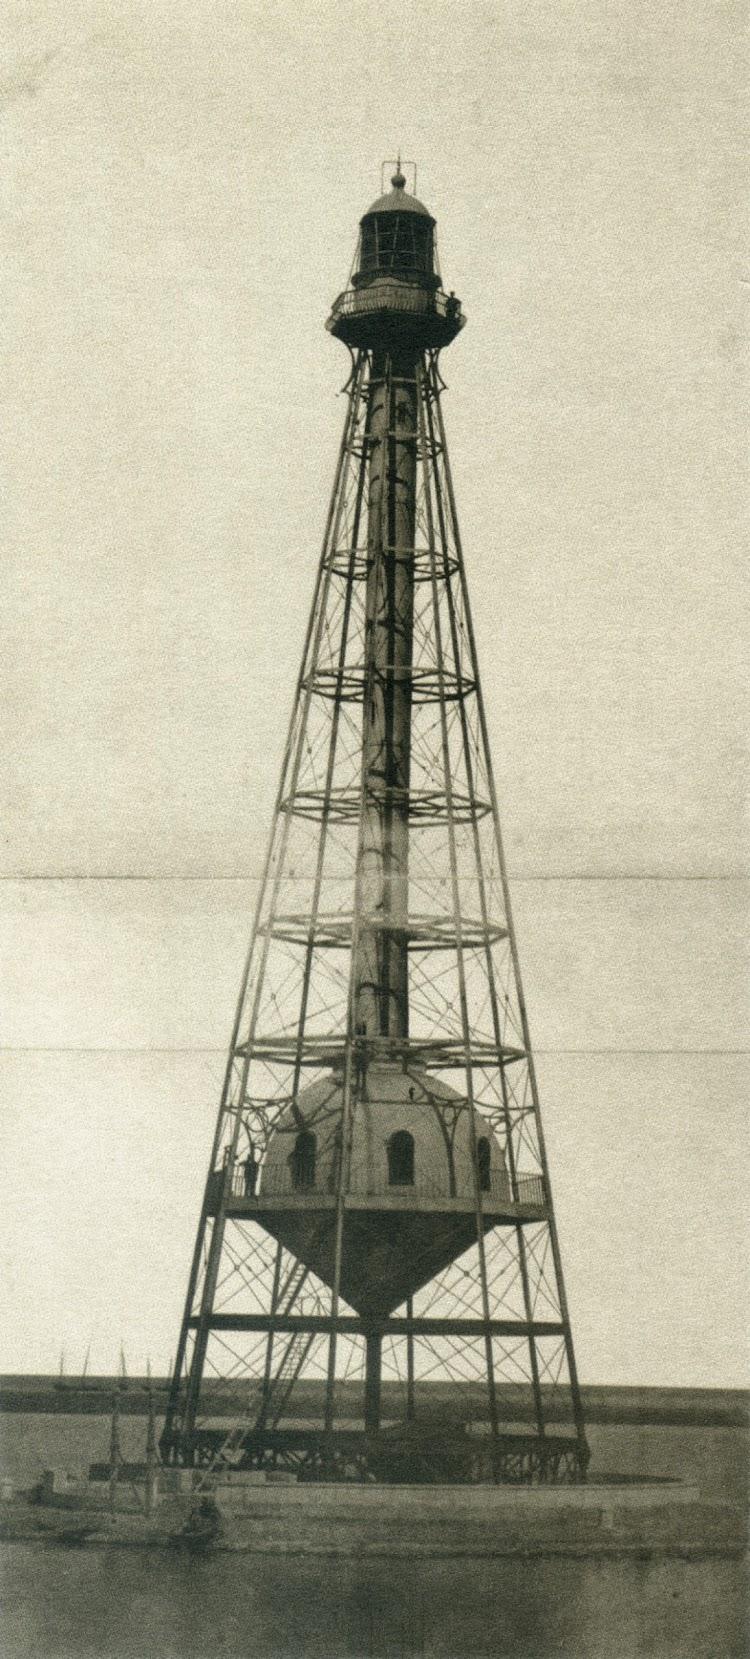 Faro de les Boques de LÉbre.C. 1867. Jose Martinez Sanchez. Del libro De Paris a Cadis.Calotipia y Col-lodio.jpg